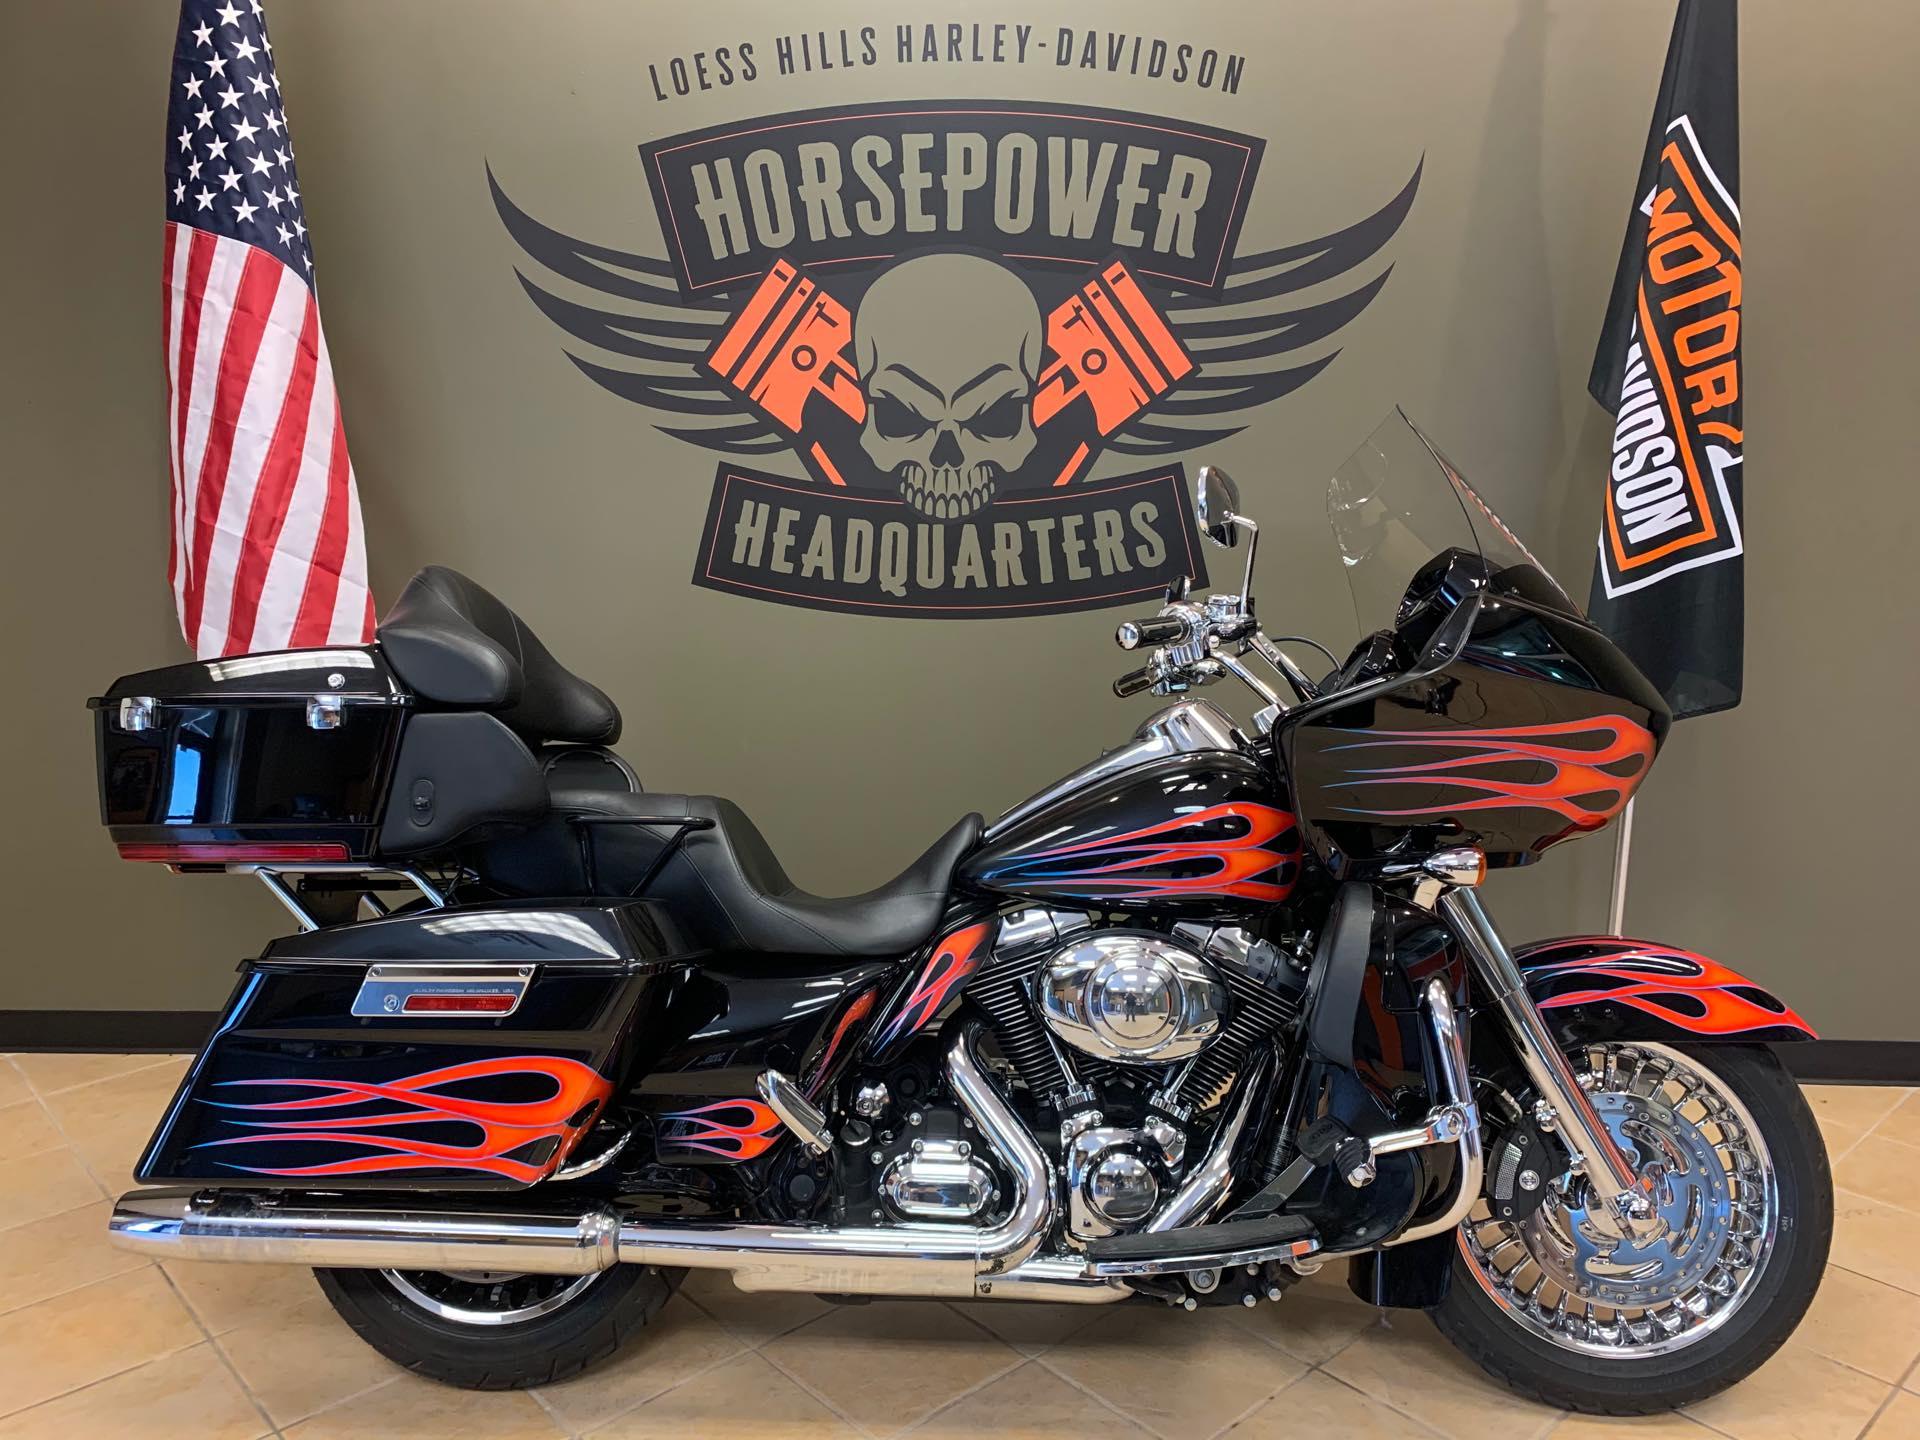 2012 Harley-Davidson Road Glide Ultra at Loess Hills Harley-Davidson